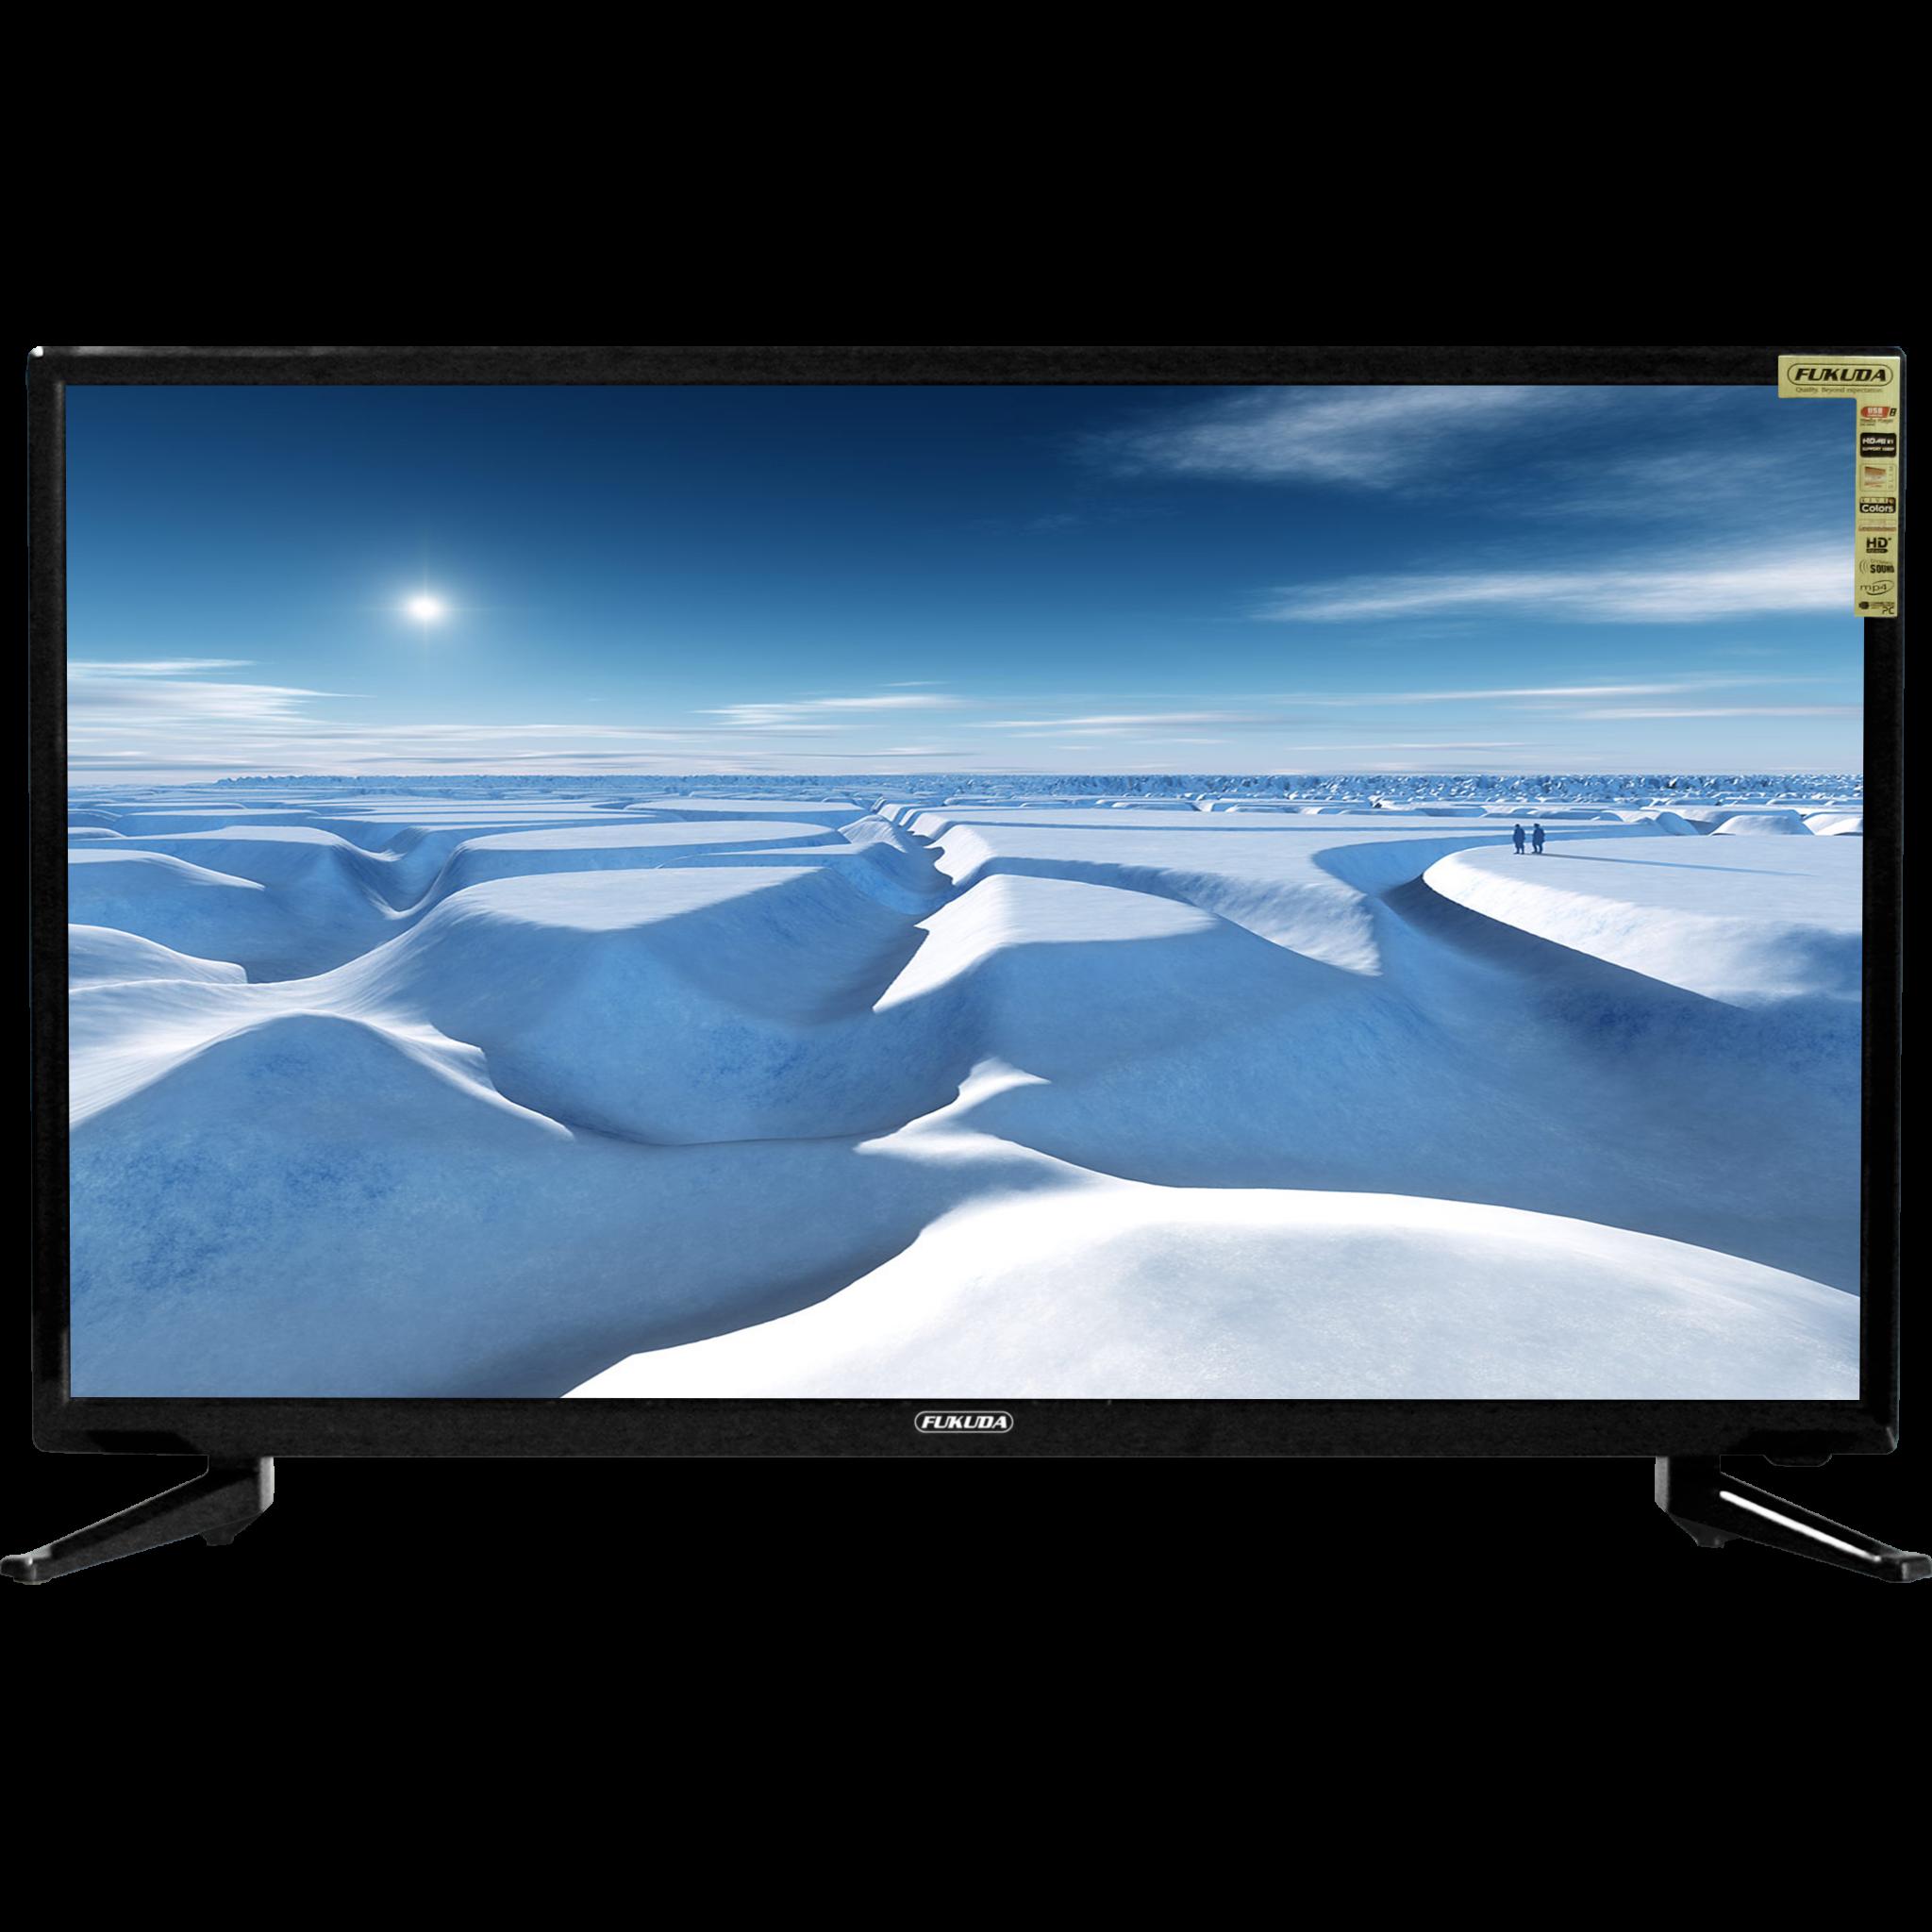 Televisions Flat Screen Led Tvs Hd Full Sony My